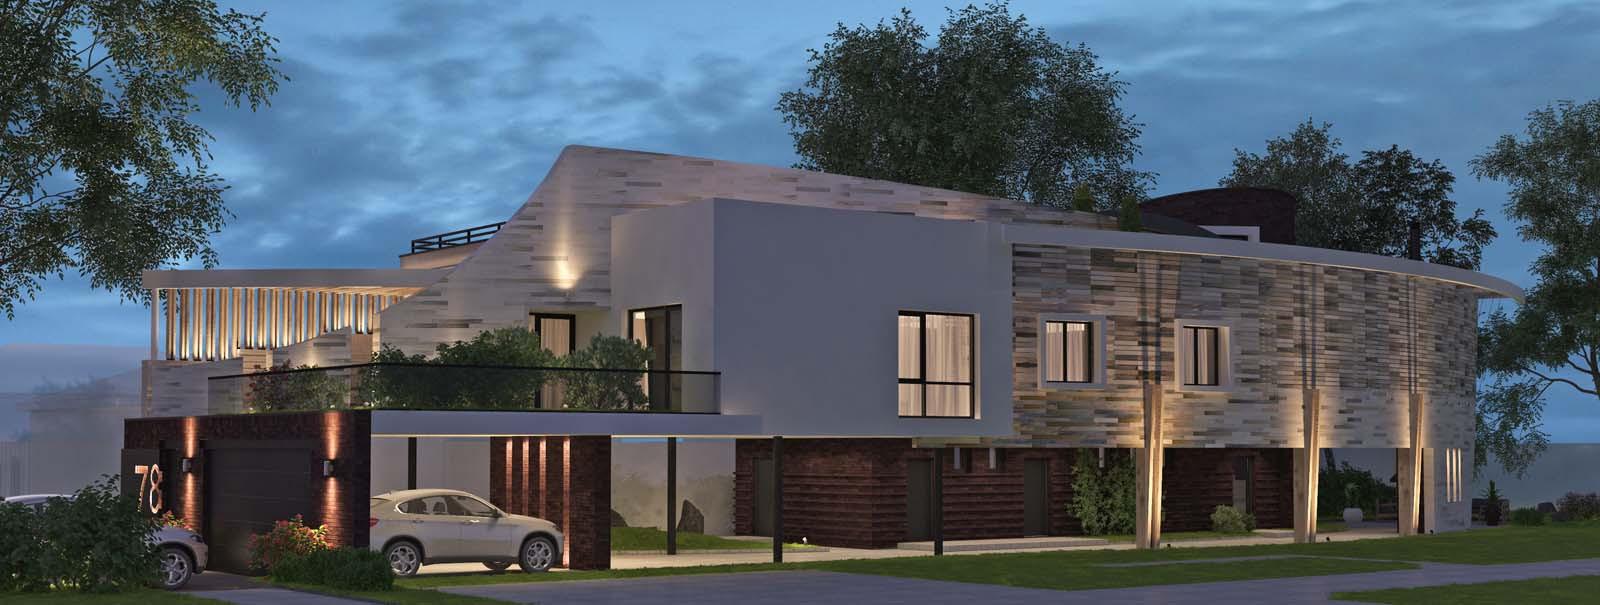 проект частного дома DECKS